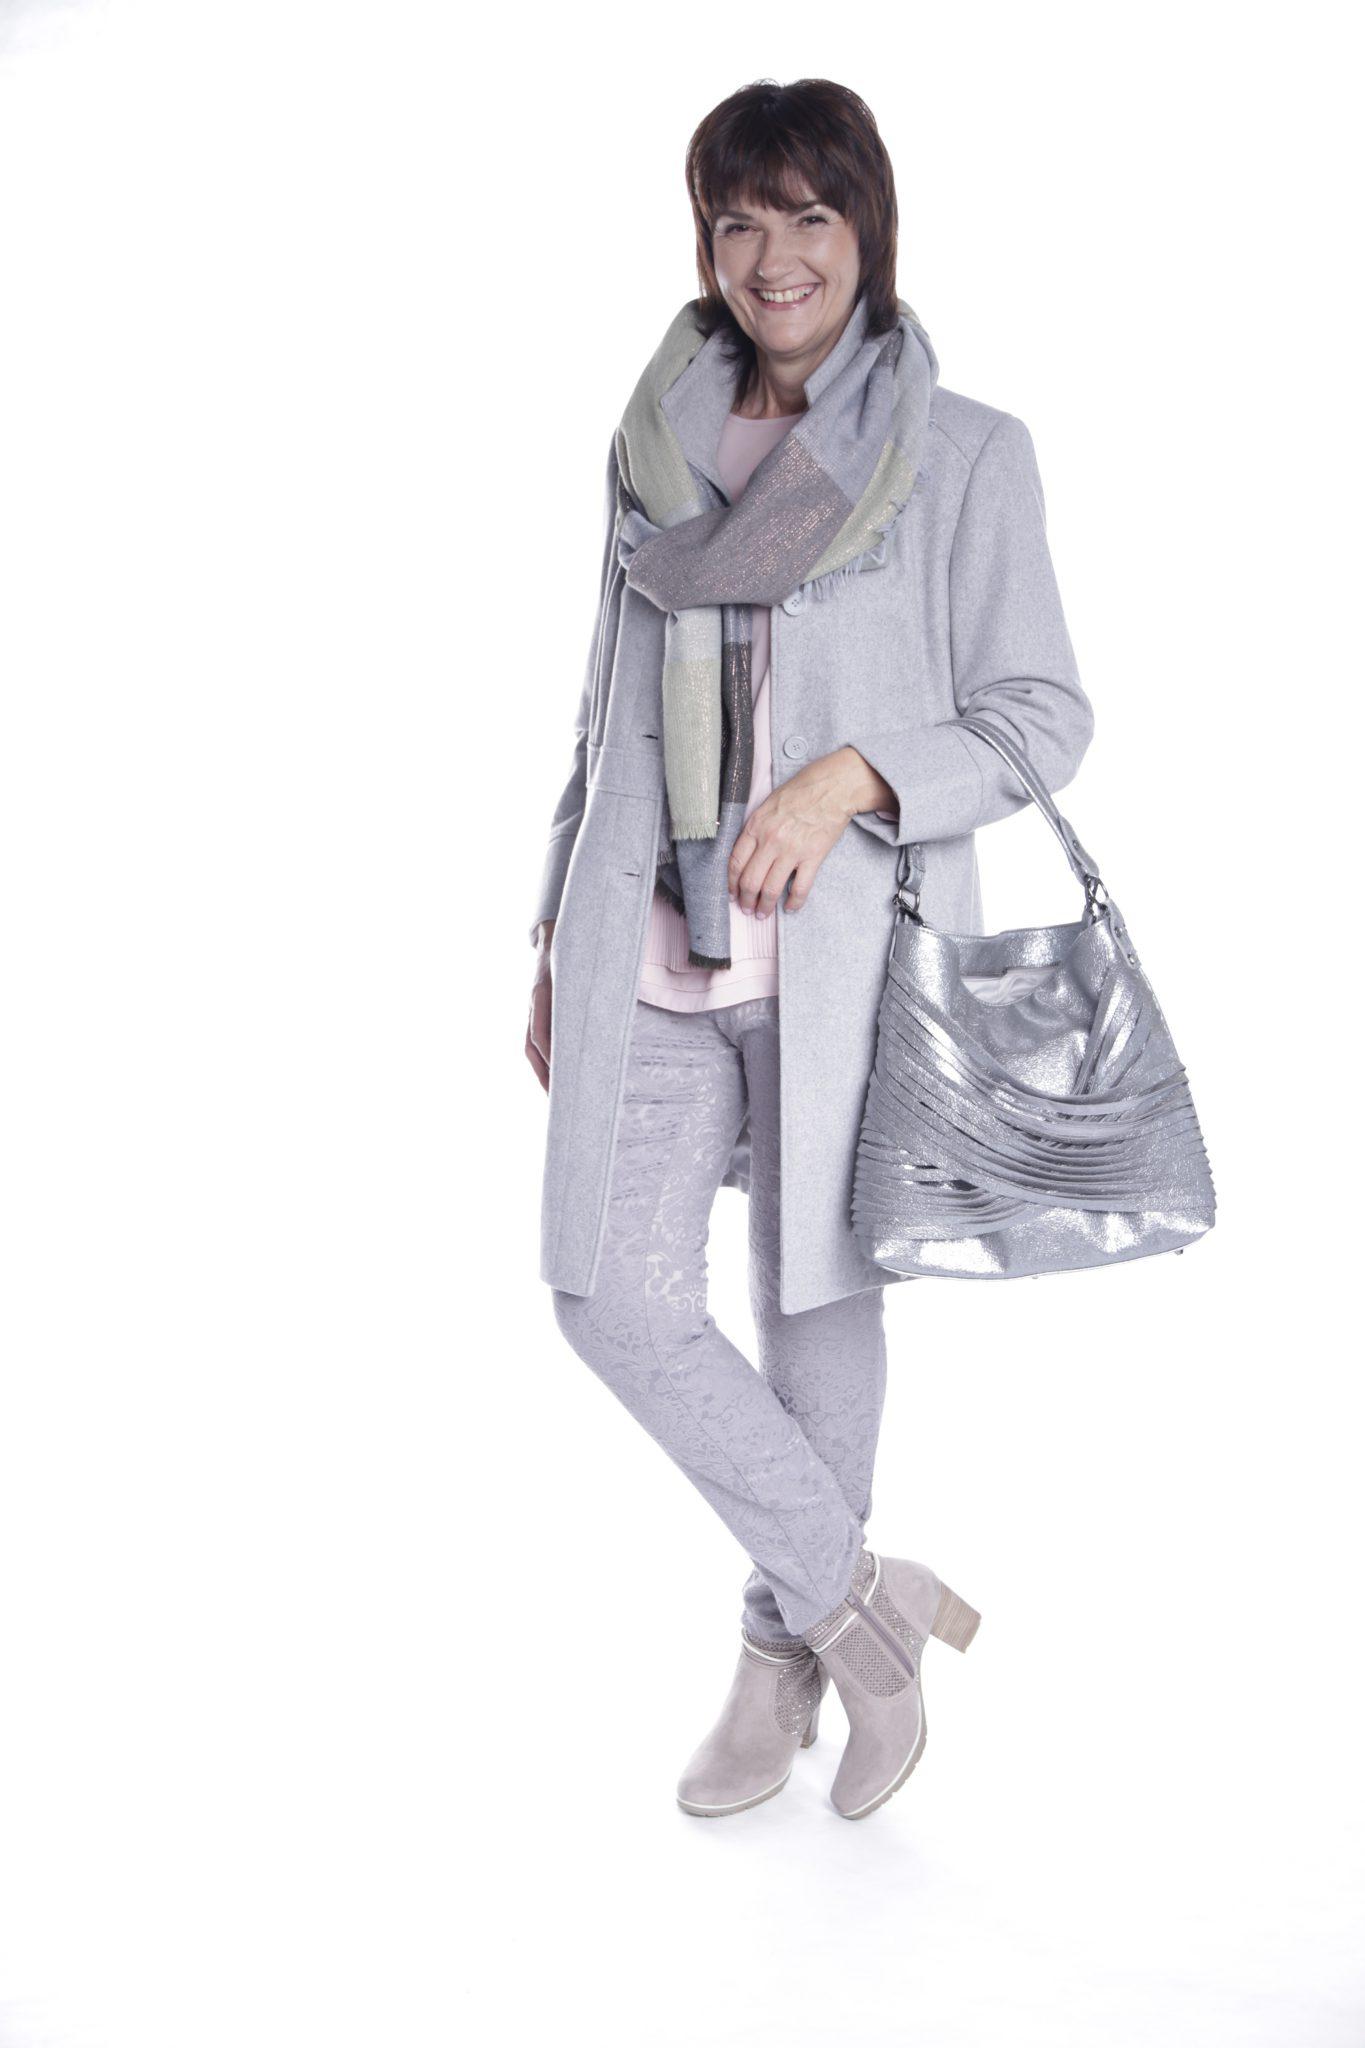 Frau in grauem Outfit mit Hose, Mantel, Schal